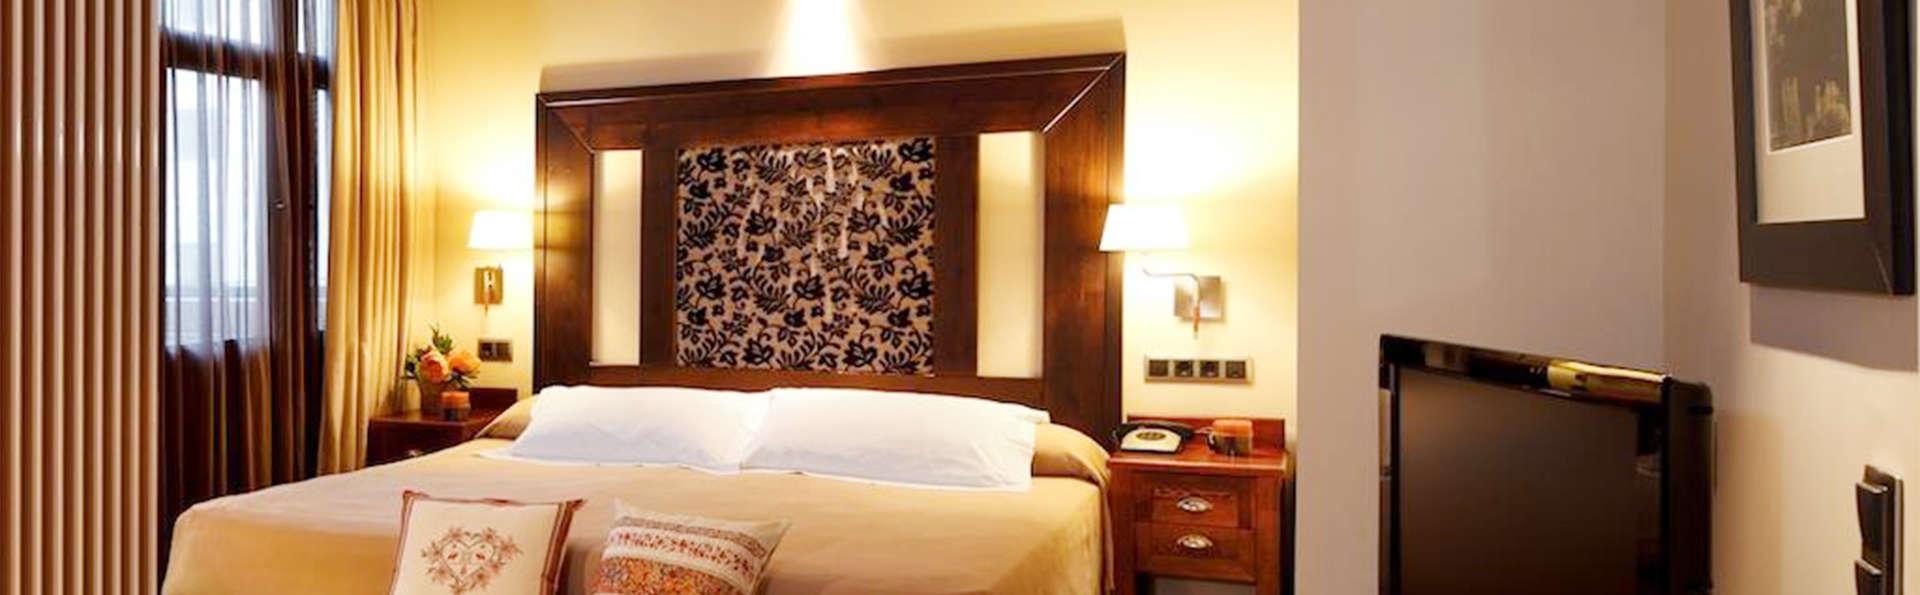 Hotel Ciria - EDIT_room8.jpg